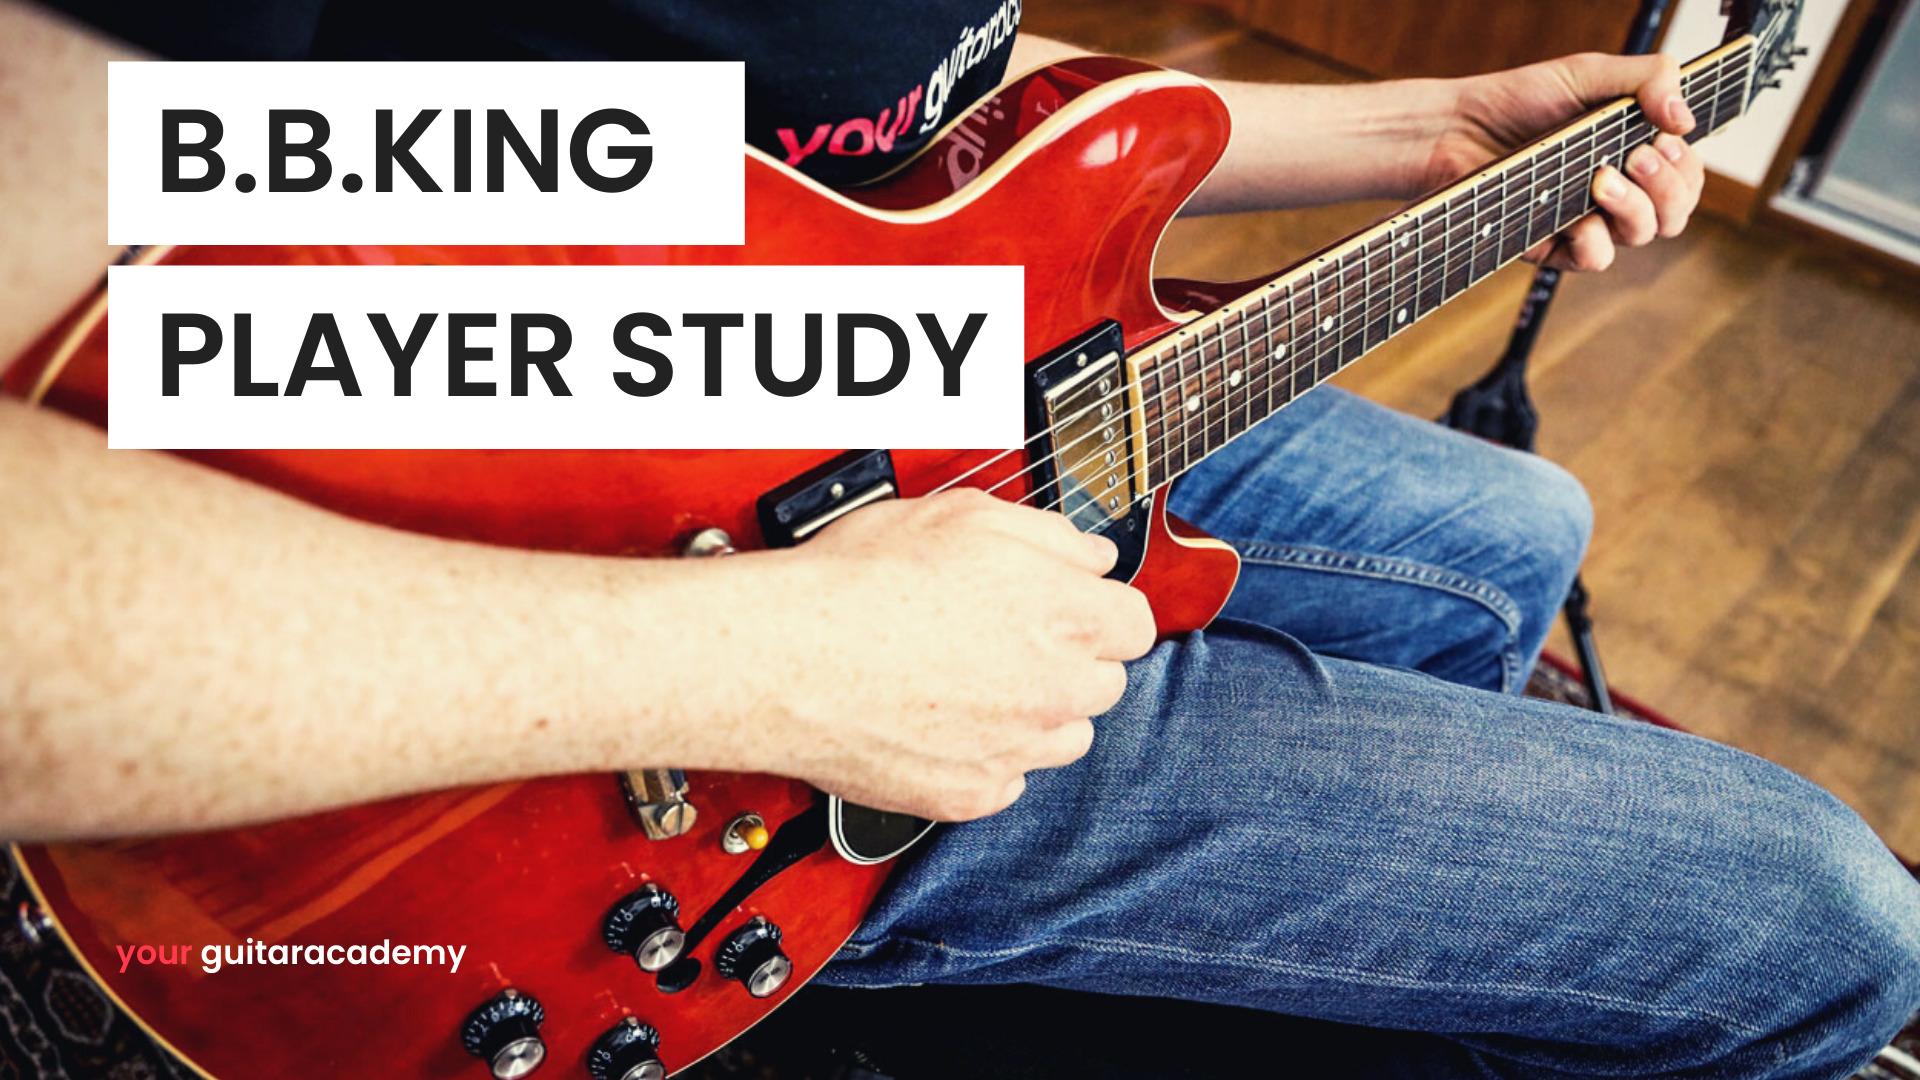 BB King Player Study Fret Zealot guitar course